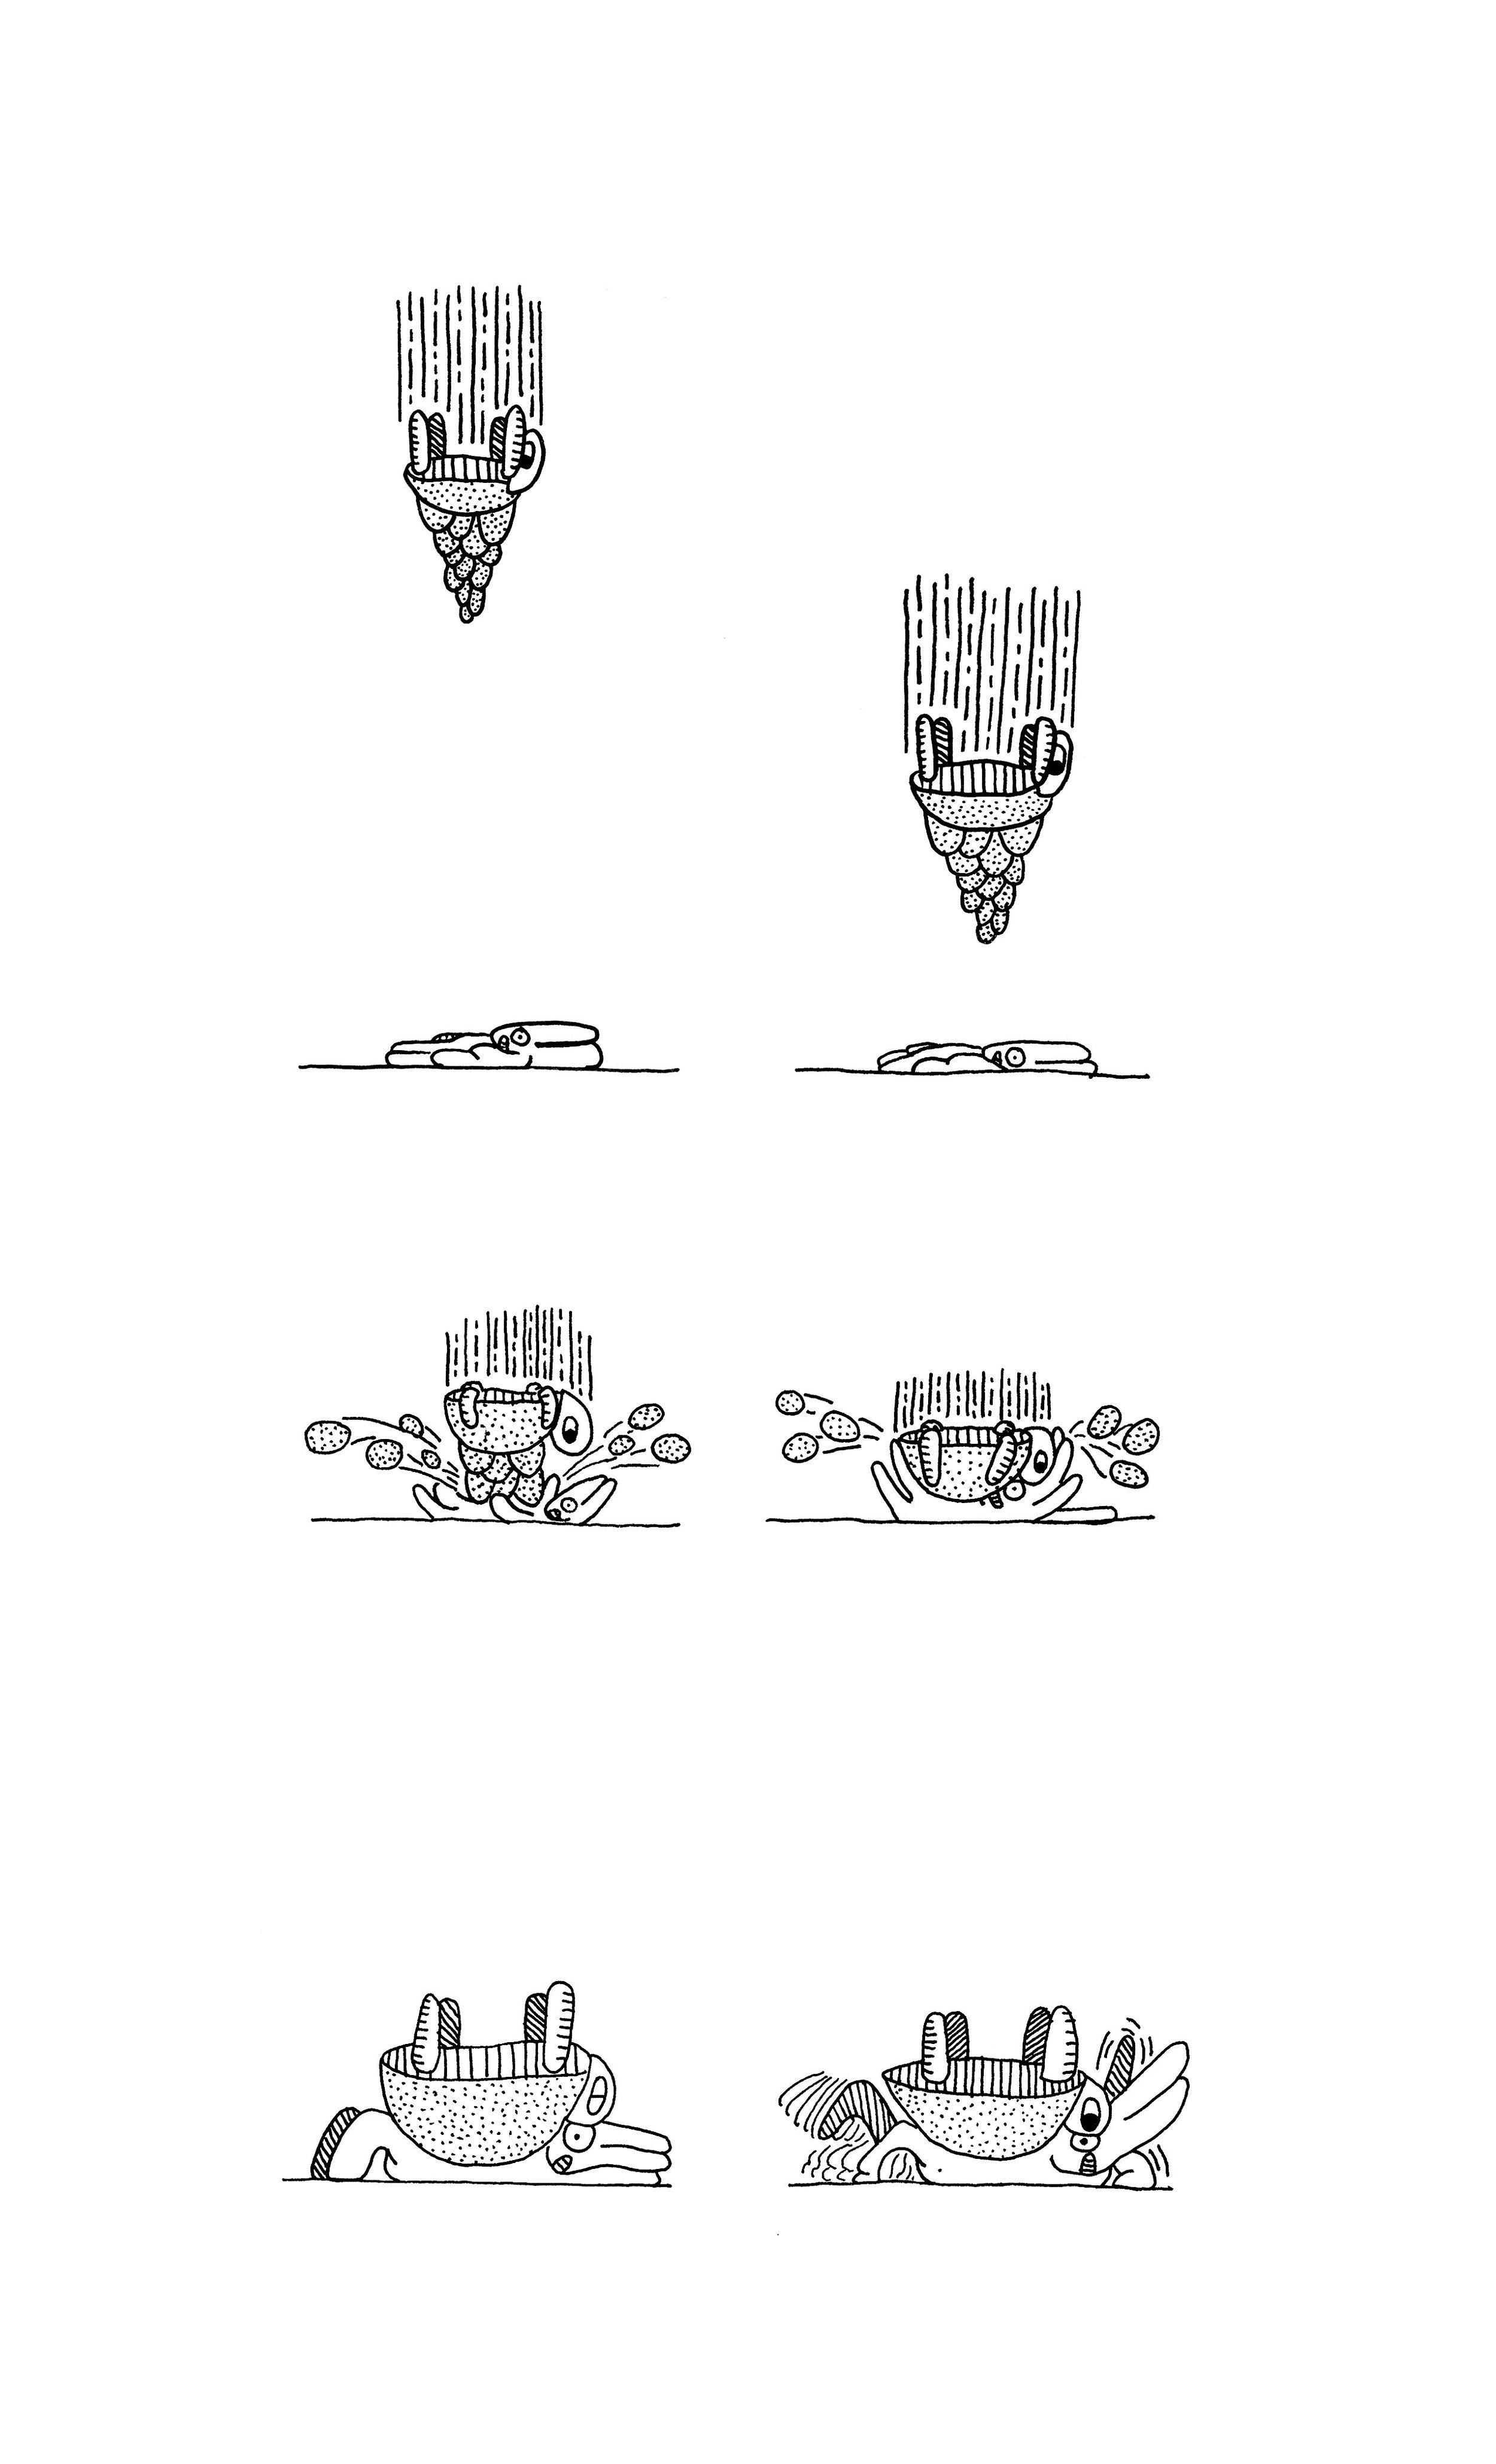 oscillator_page15.jpg